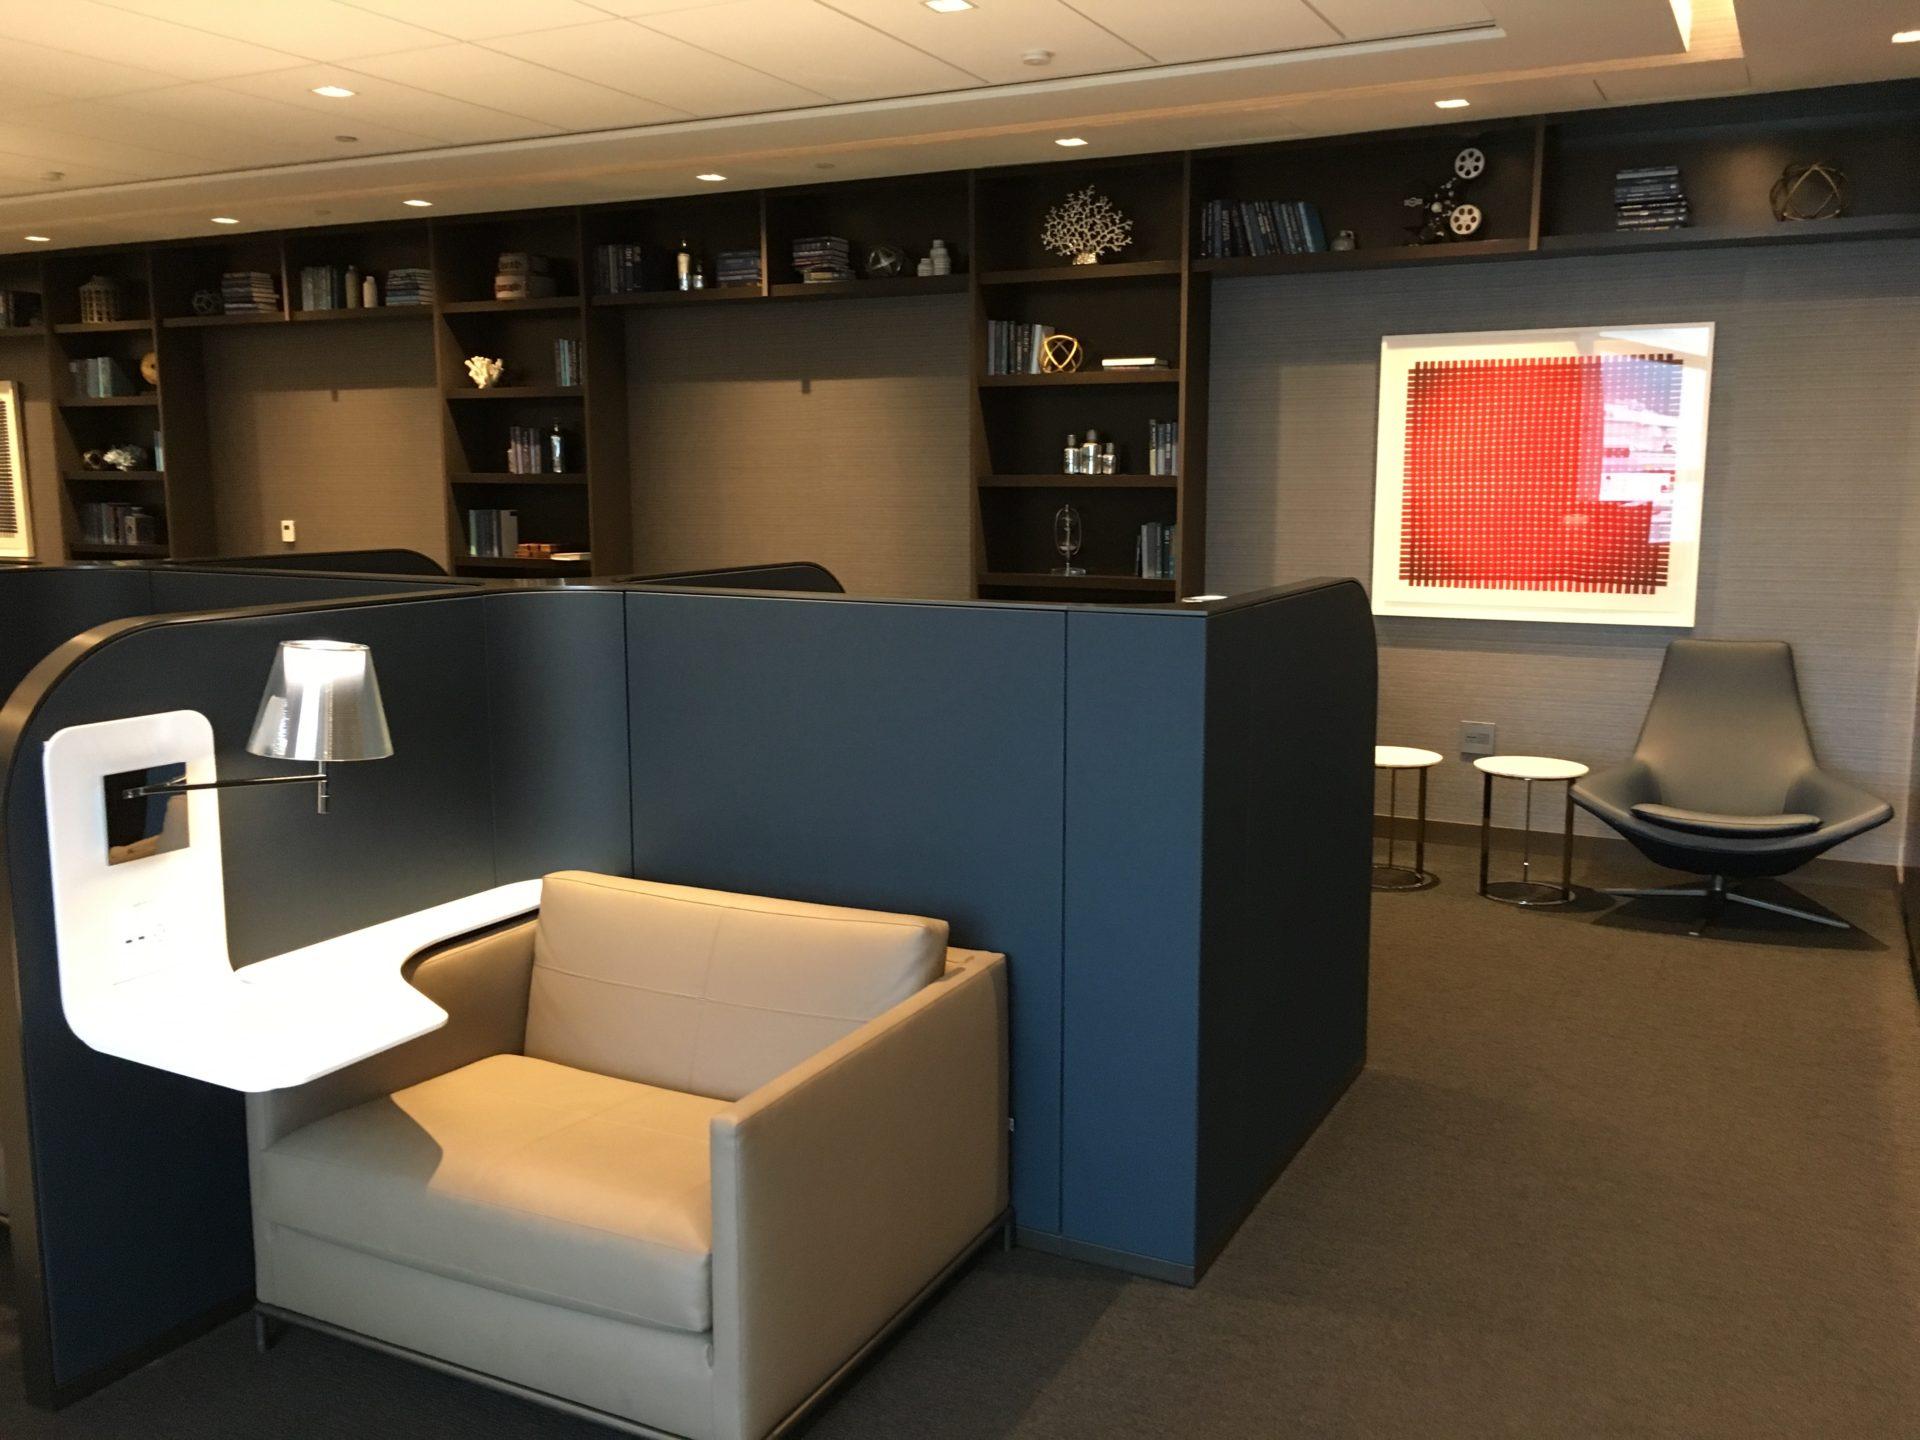 United Polaris Lounge San Francisco Bibliothek